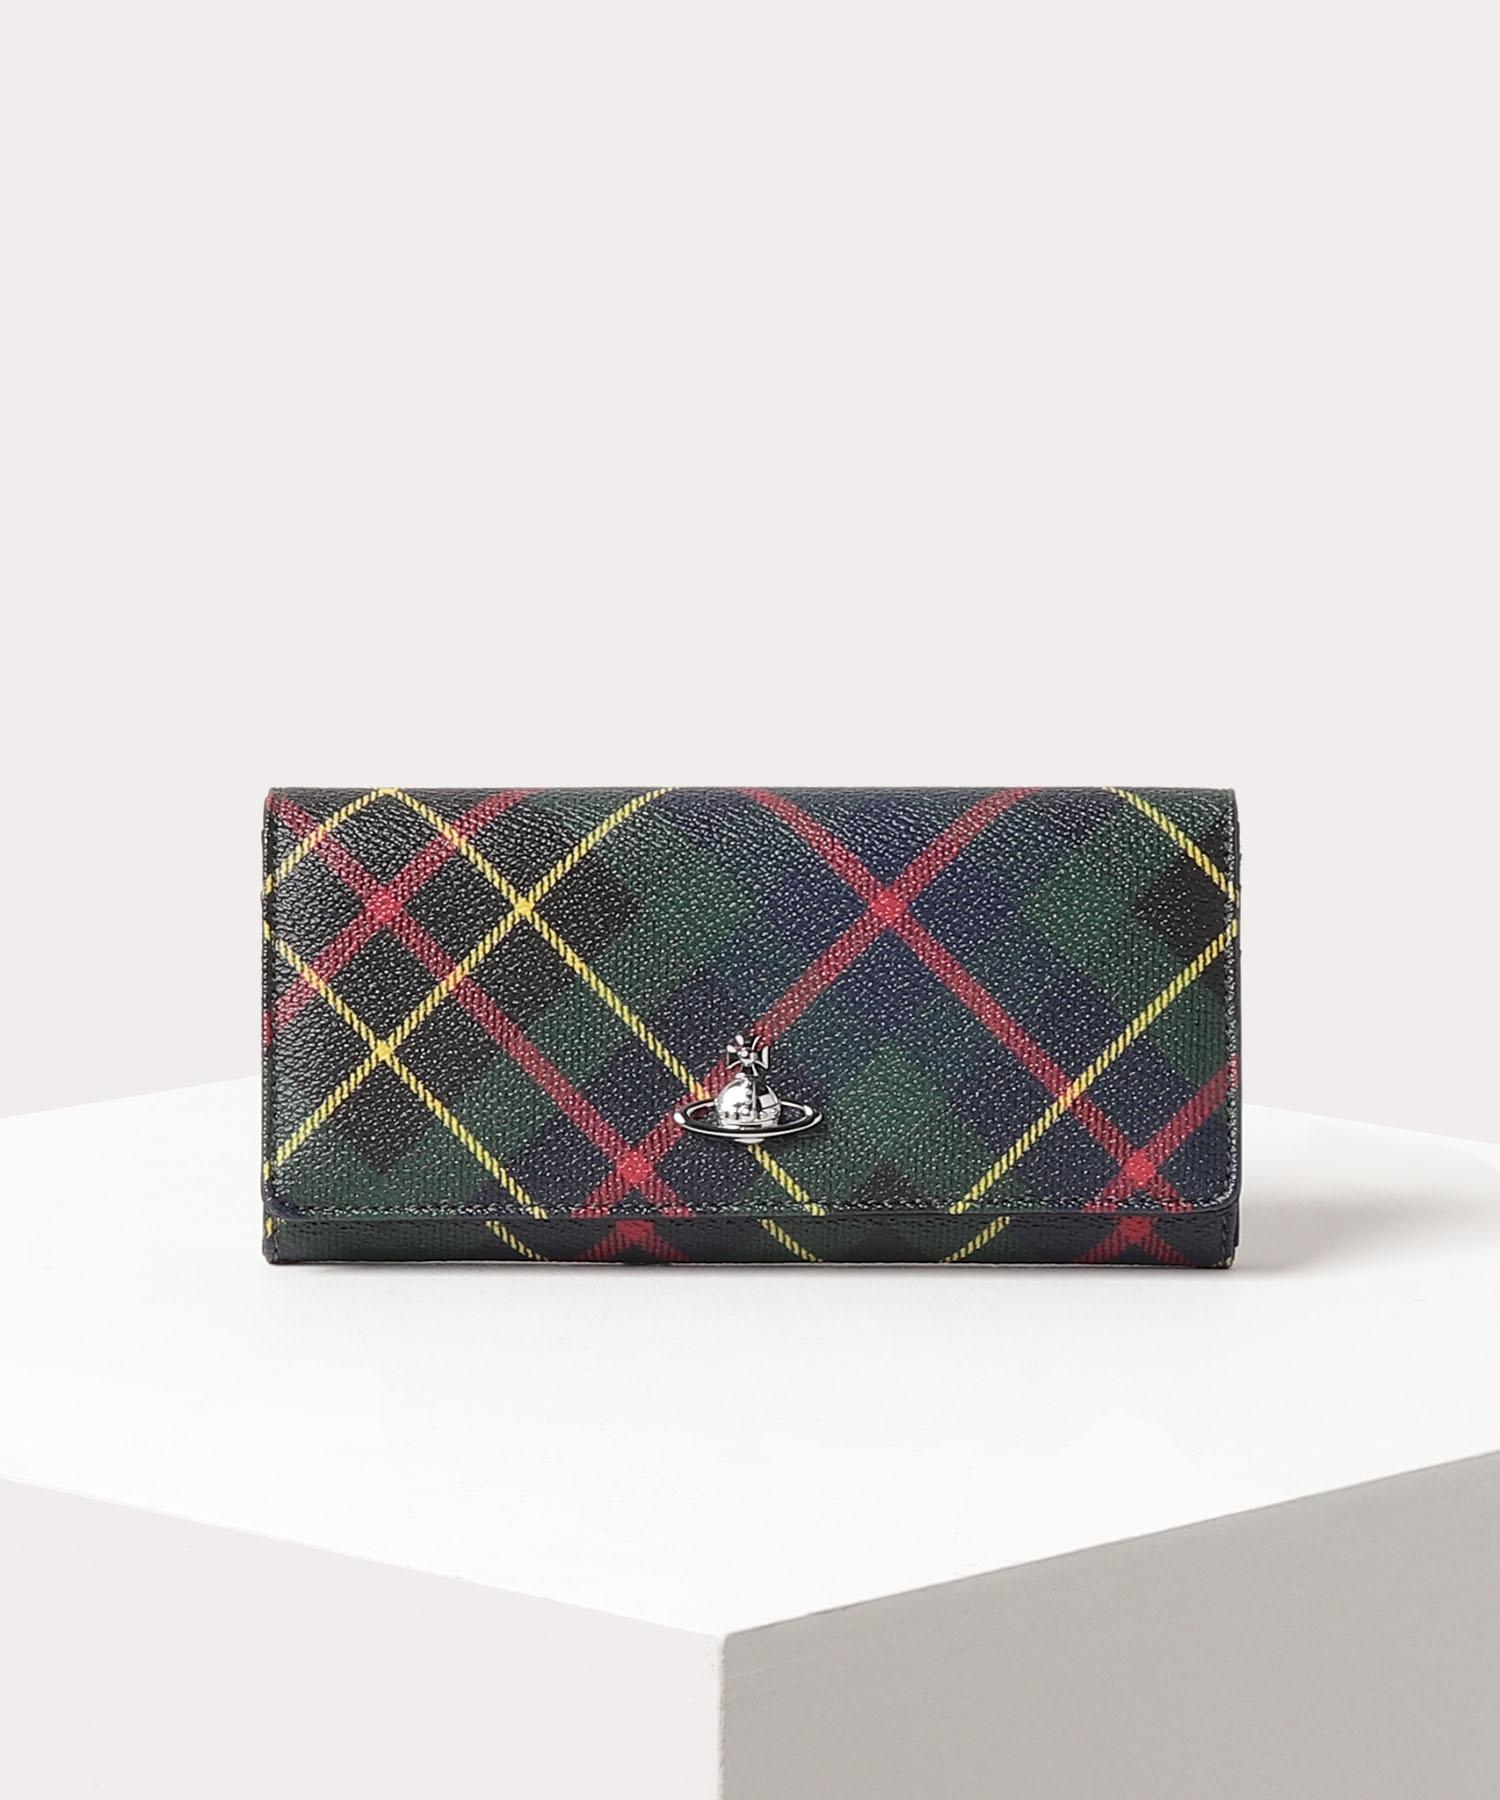 Vivienne Westwood(ヴィヴィアン・ウエストウッド)『DERBY 長財布(299702LW11)』